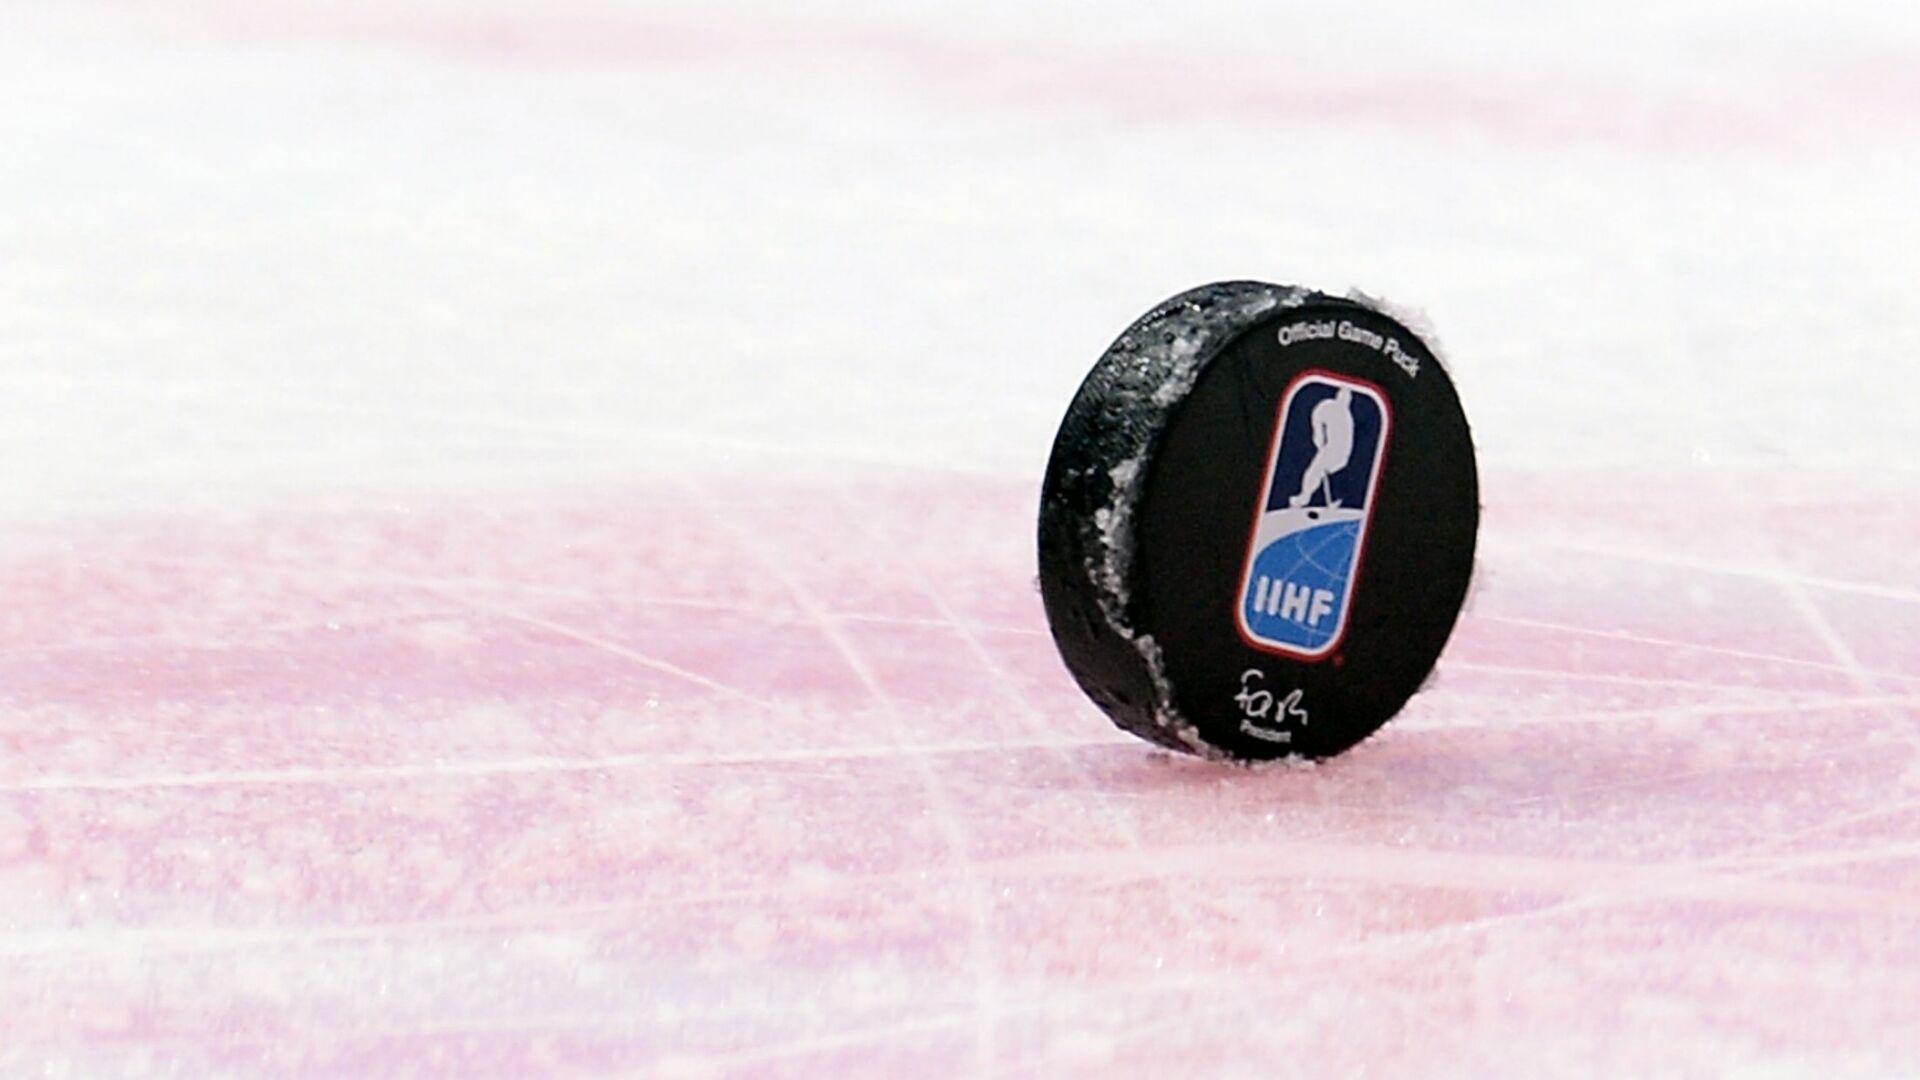 Шайба IIHF - РИА Новости, 1920, 30.01.2021